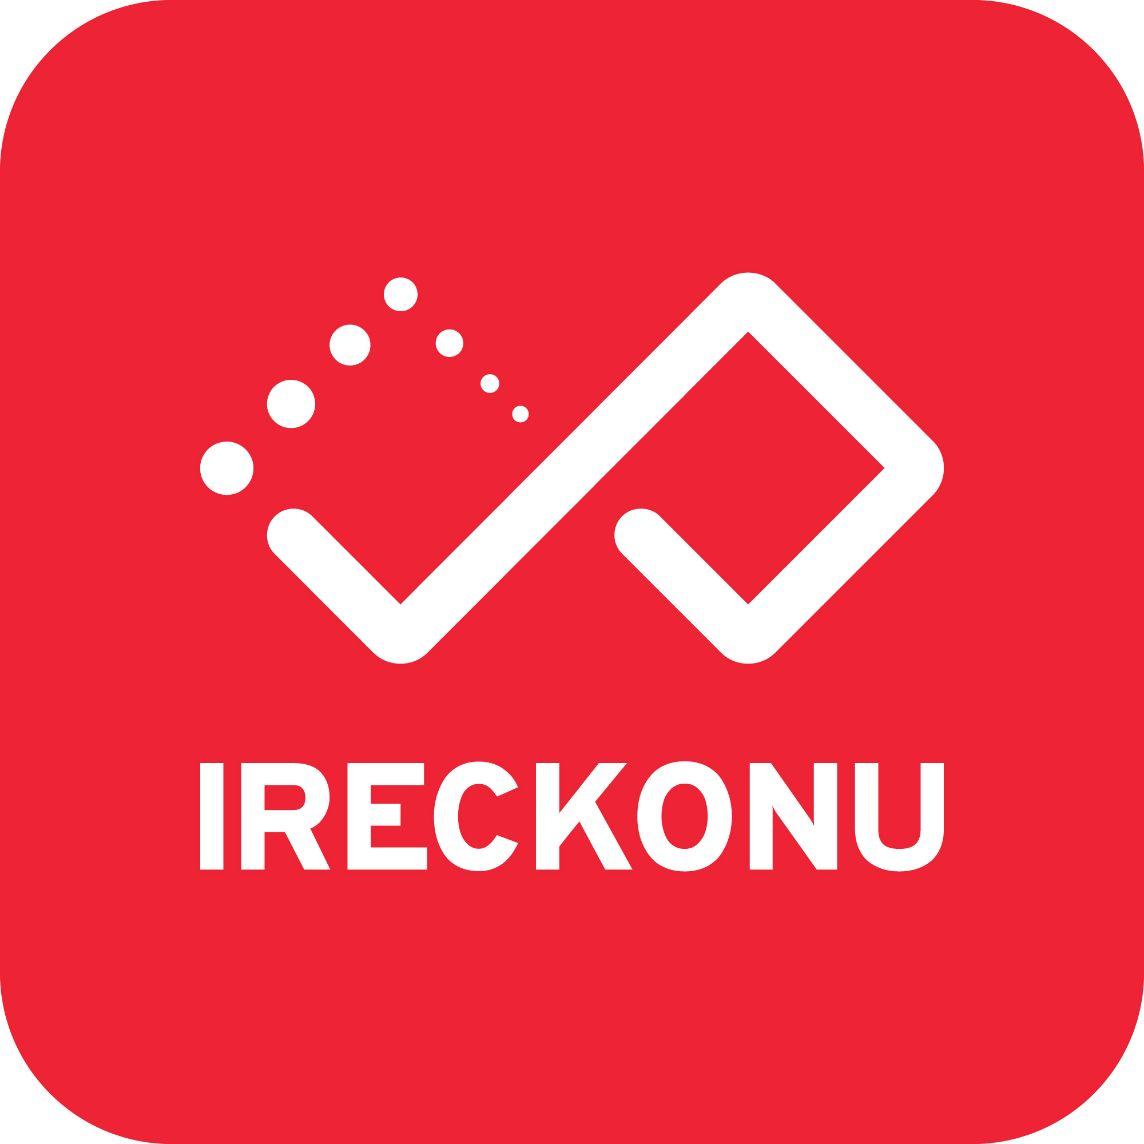 iReckonU